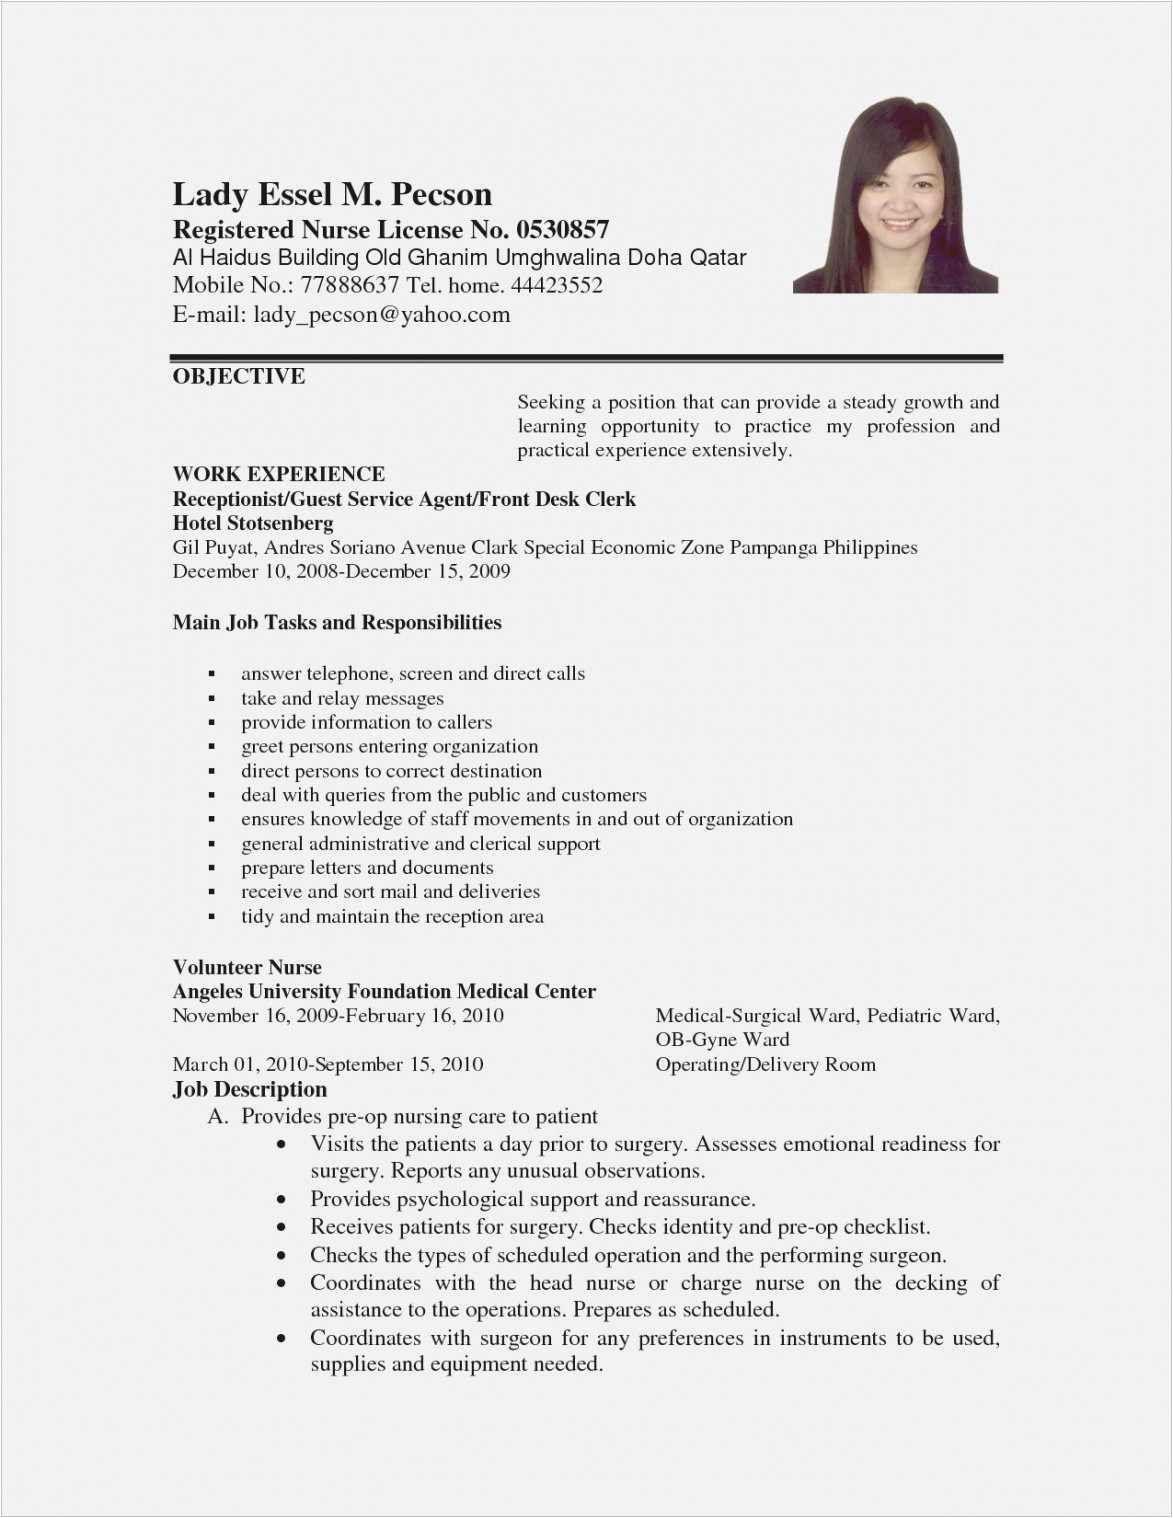 Example Of Dental Receptionist Resume In 2021 Job Resume Format Basic Resume Job Resume Samples